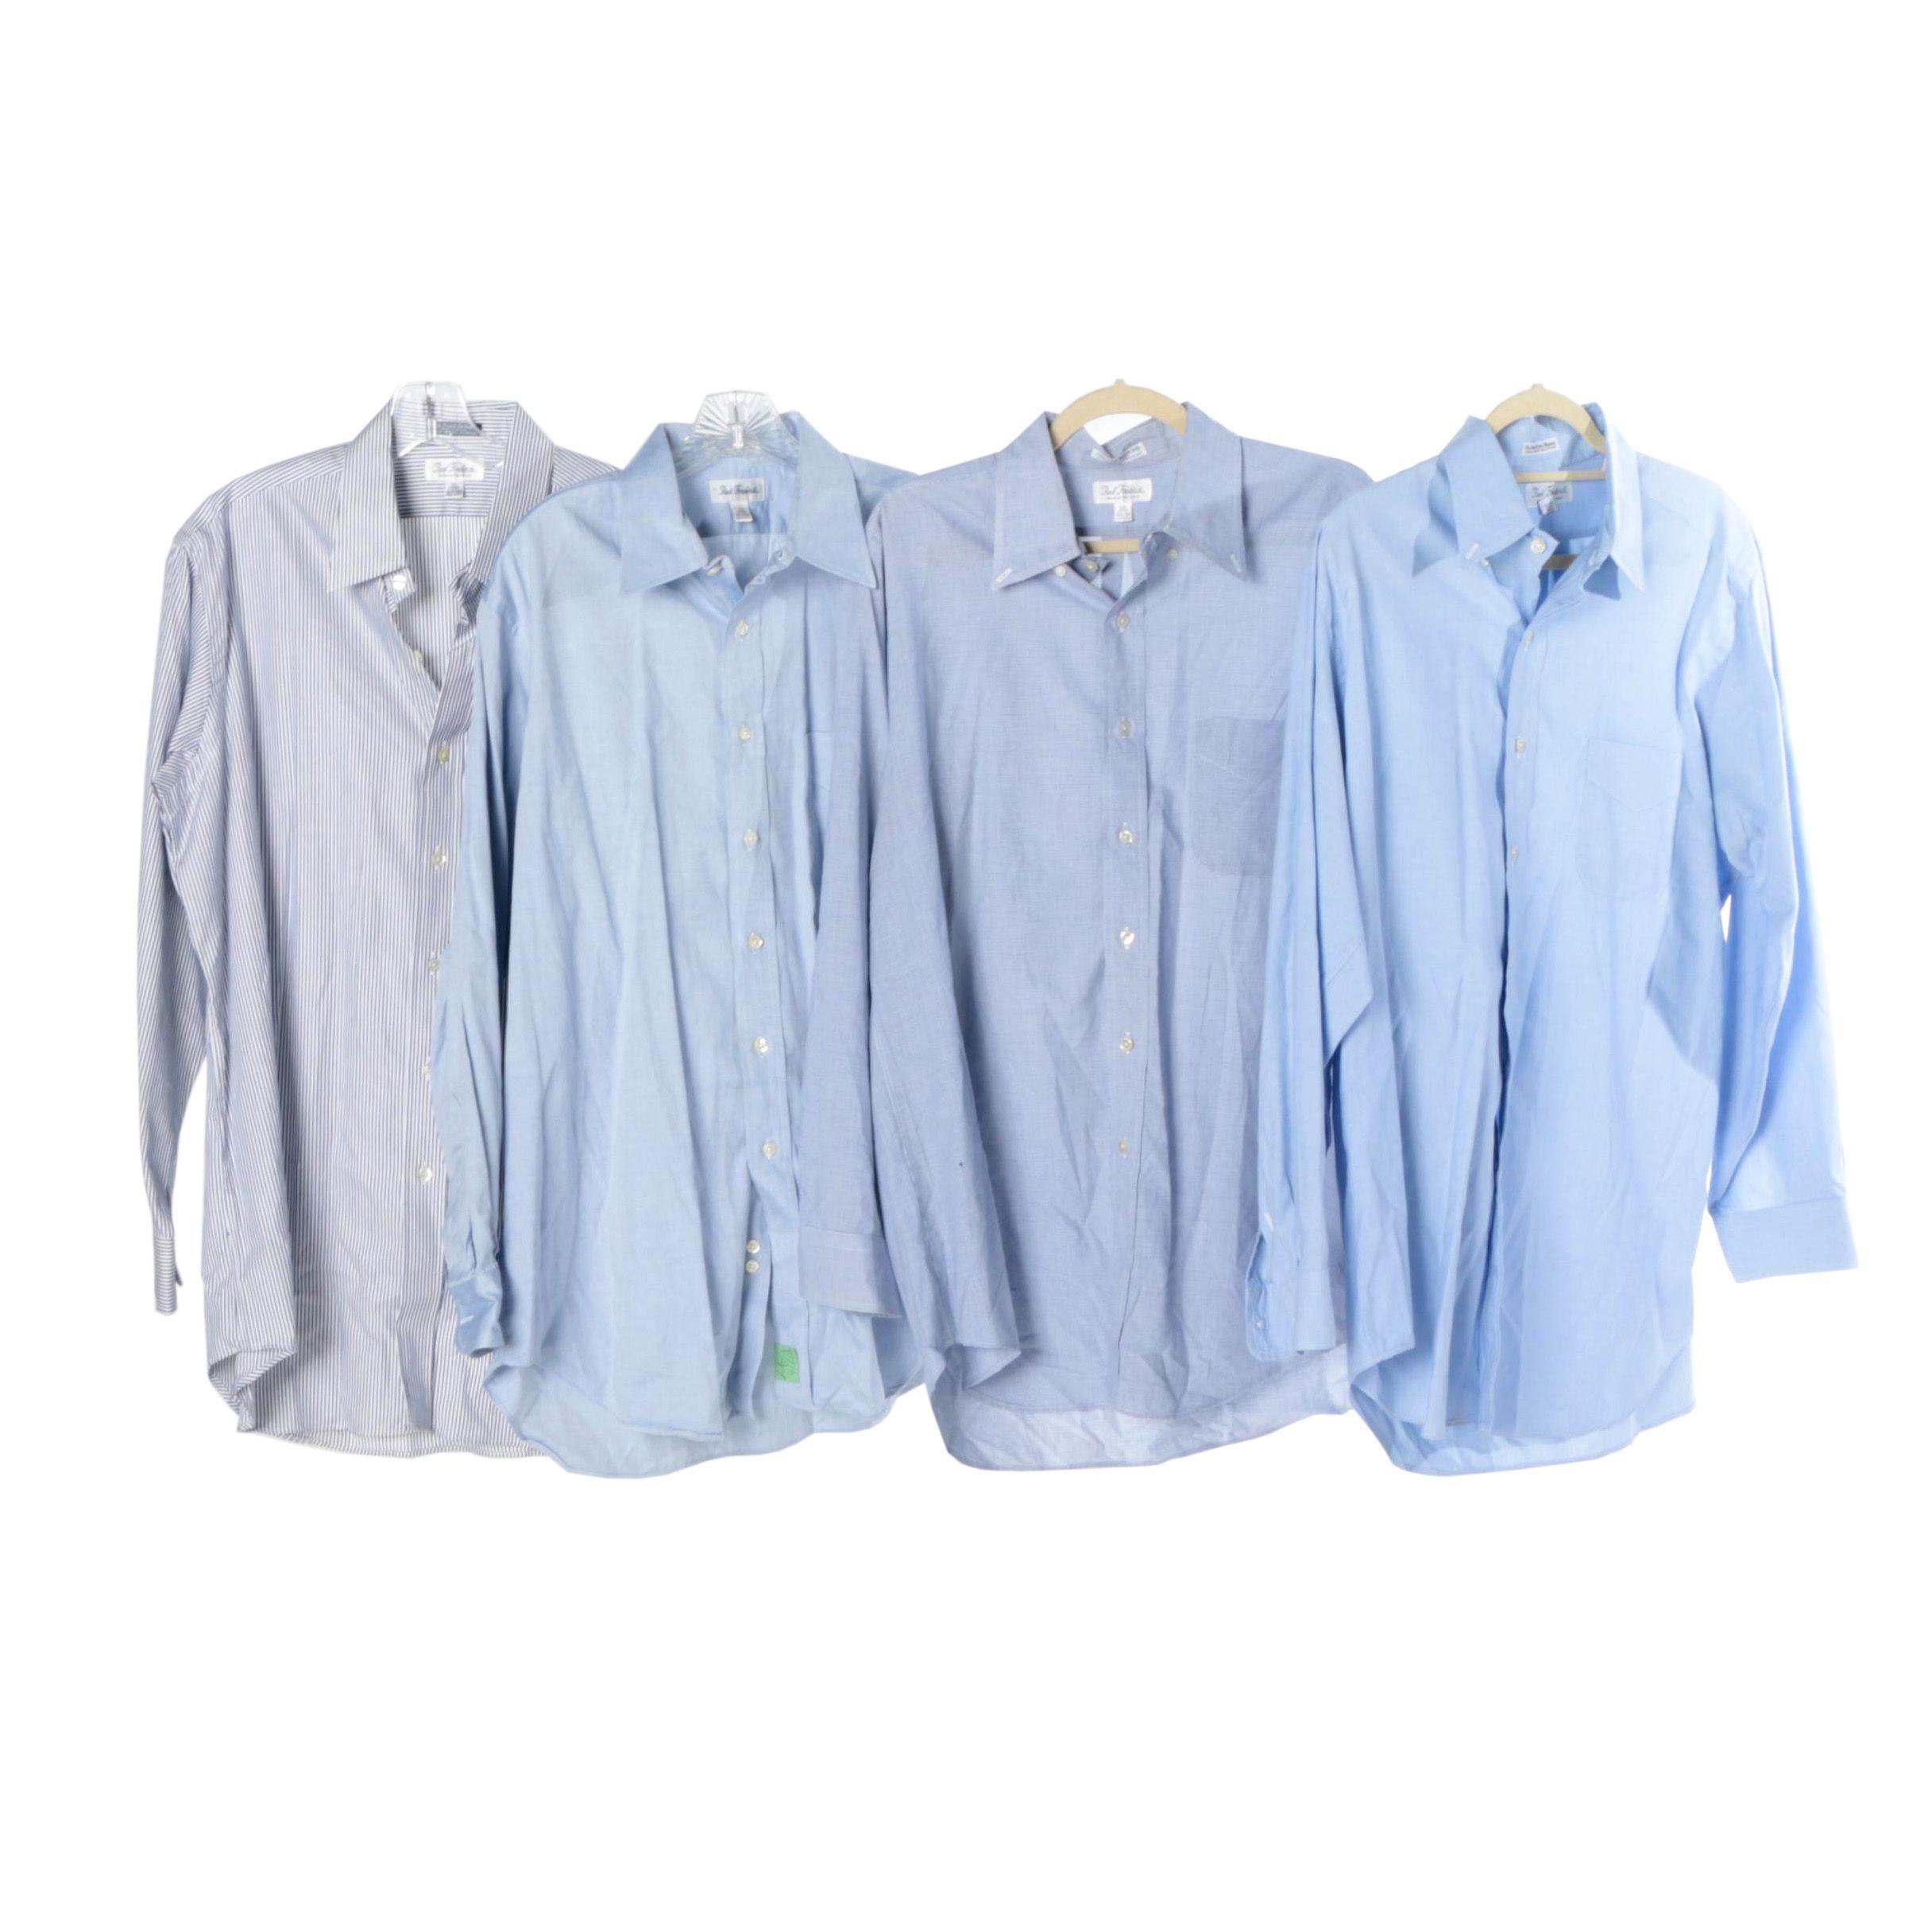 Men's Paul Fredrick Button-Down Dress Shirts